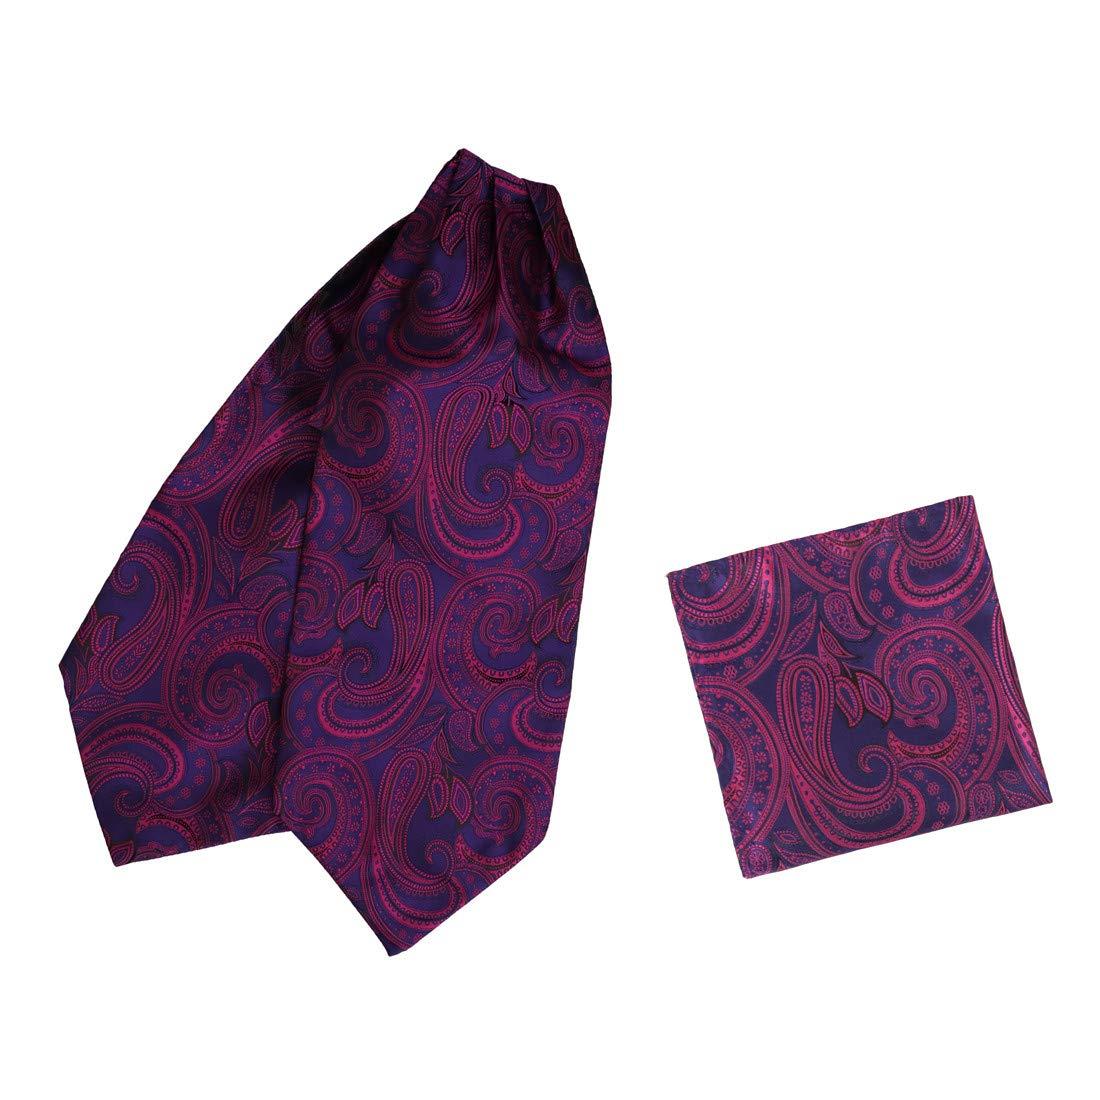 Epoint Mens Fashion Wedding Paisley Cravat Microfiber Ascot Tie Hanky Set